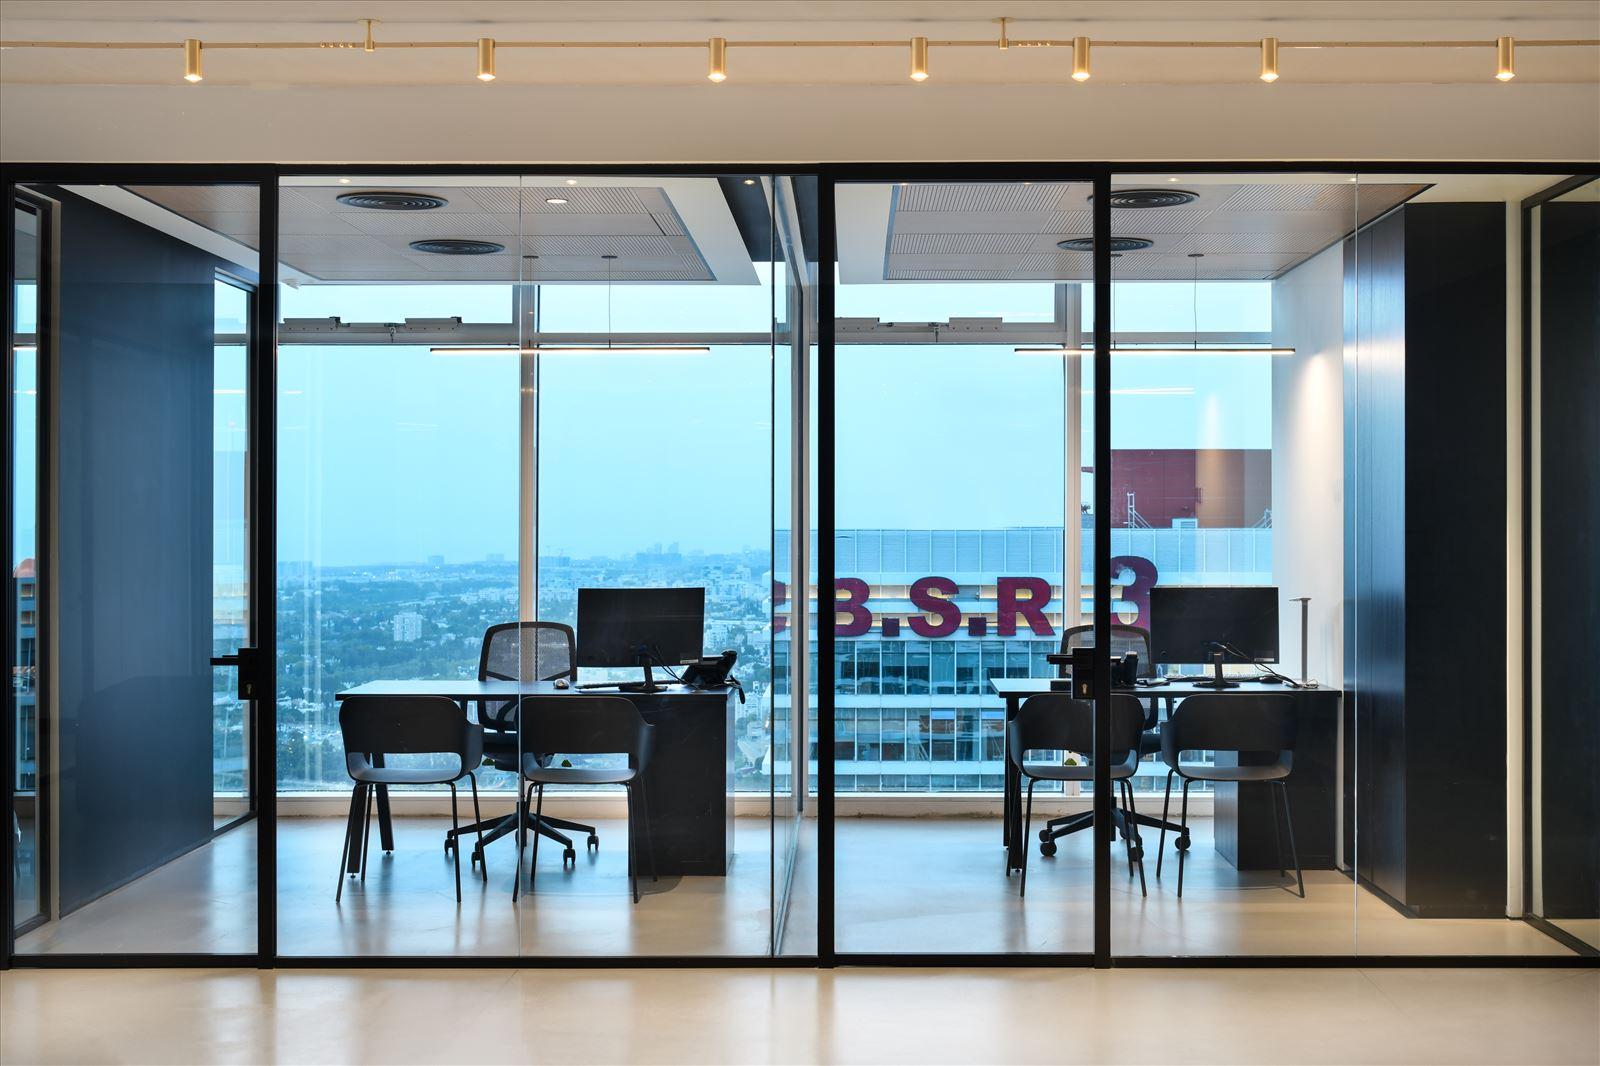 Divident office מסדרון המשרד מואר בגוף תאורה בעיצובו של קמחי תאורה